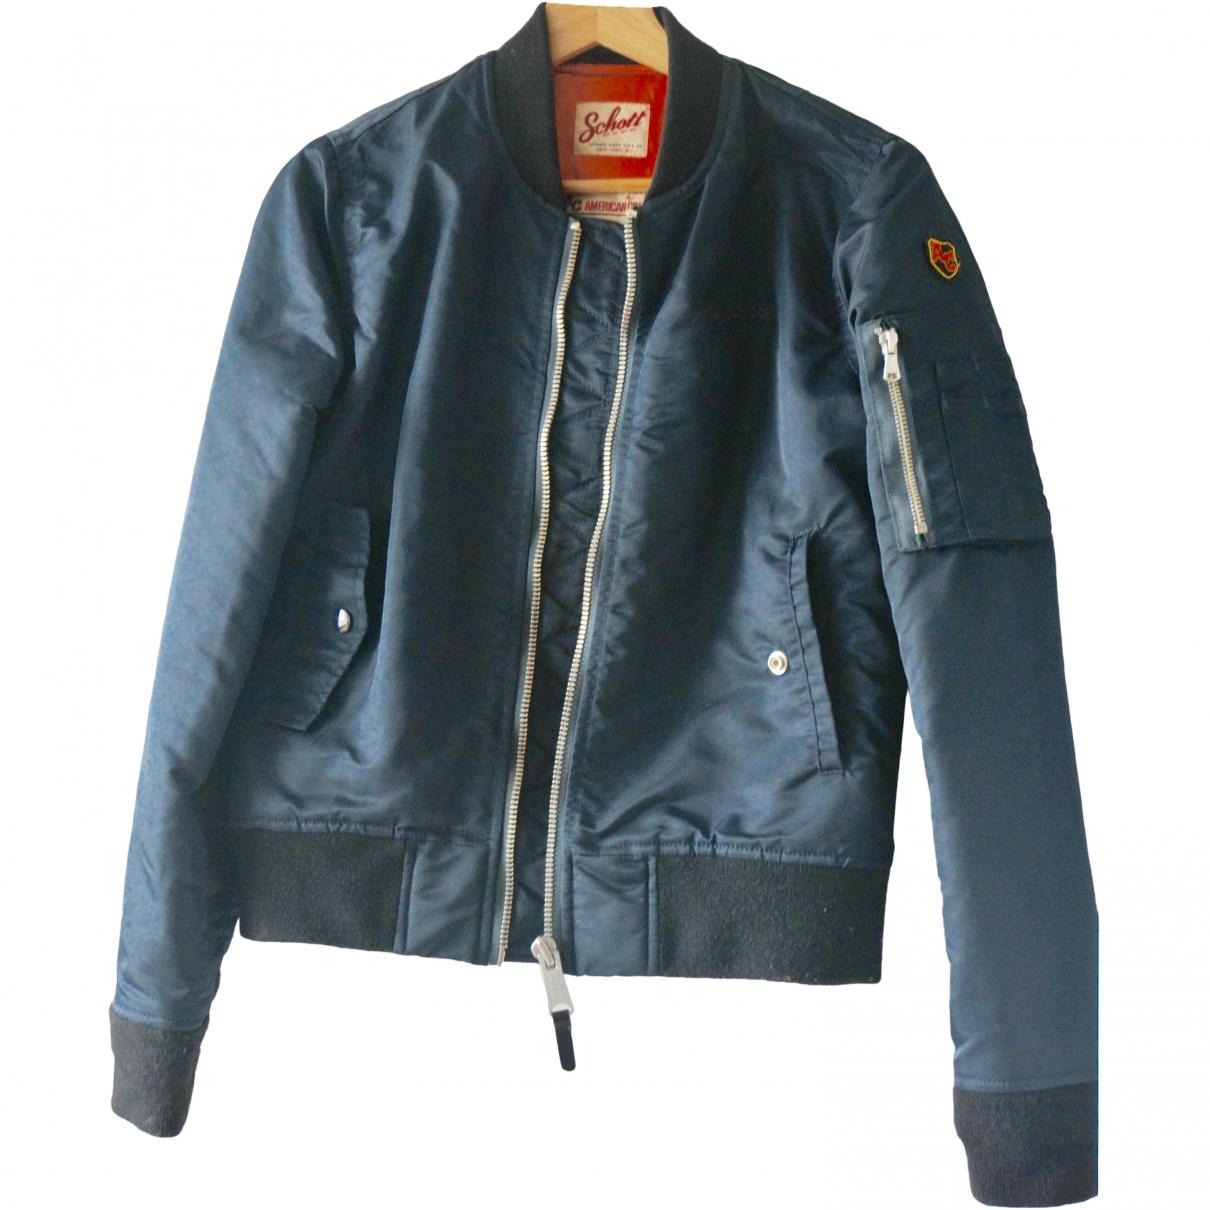 Schott \N Blue jacket for Women M International